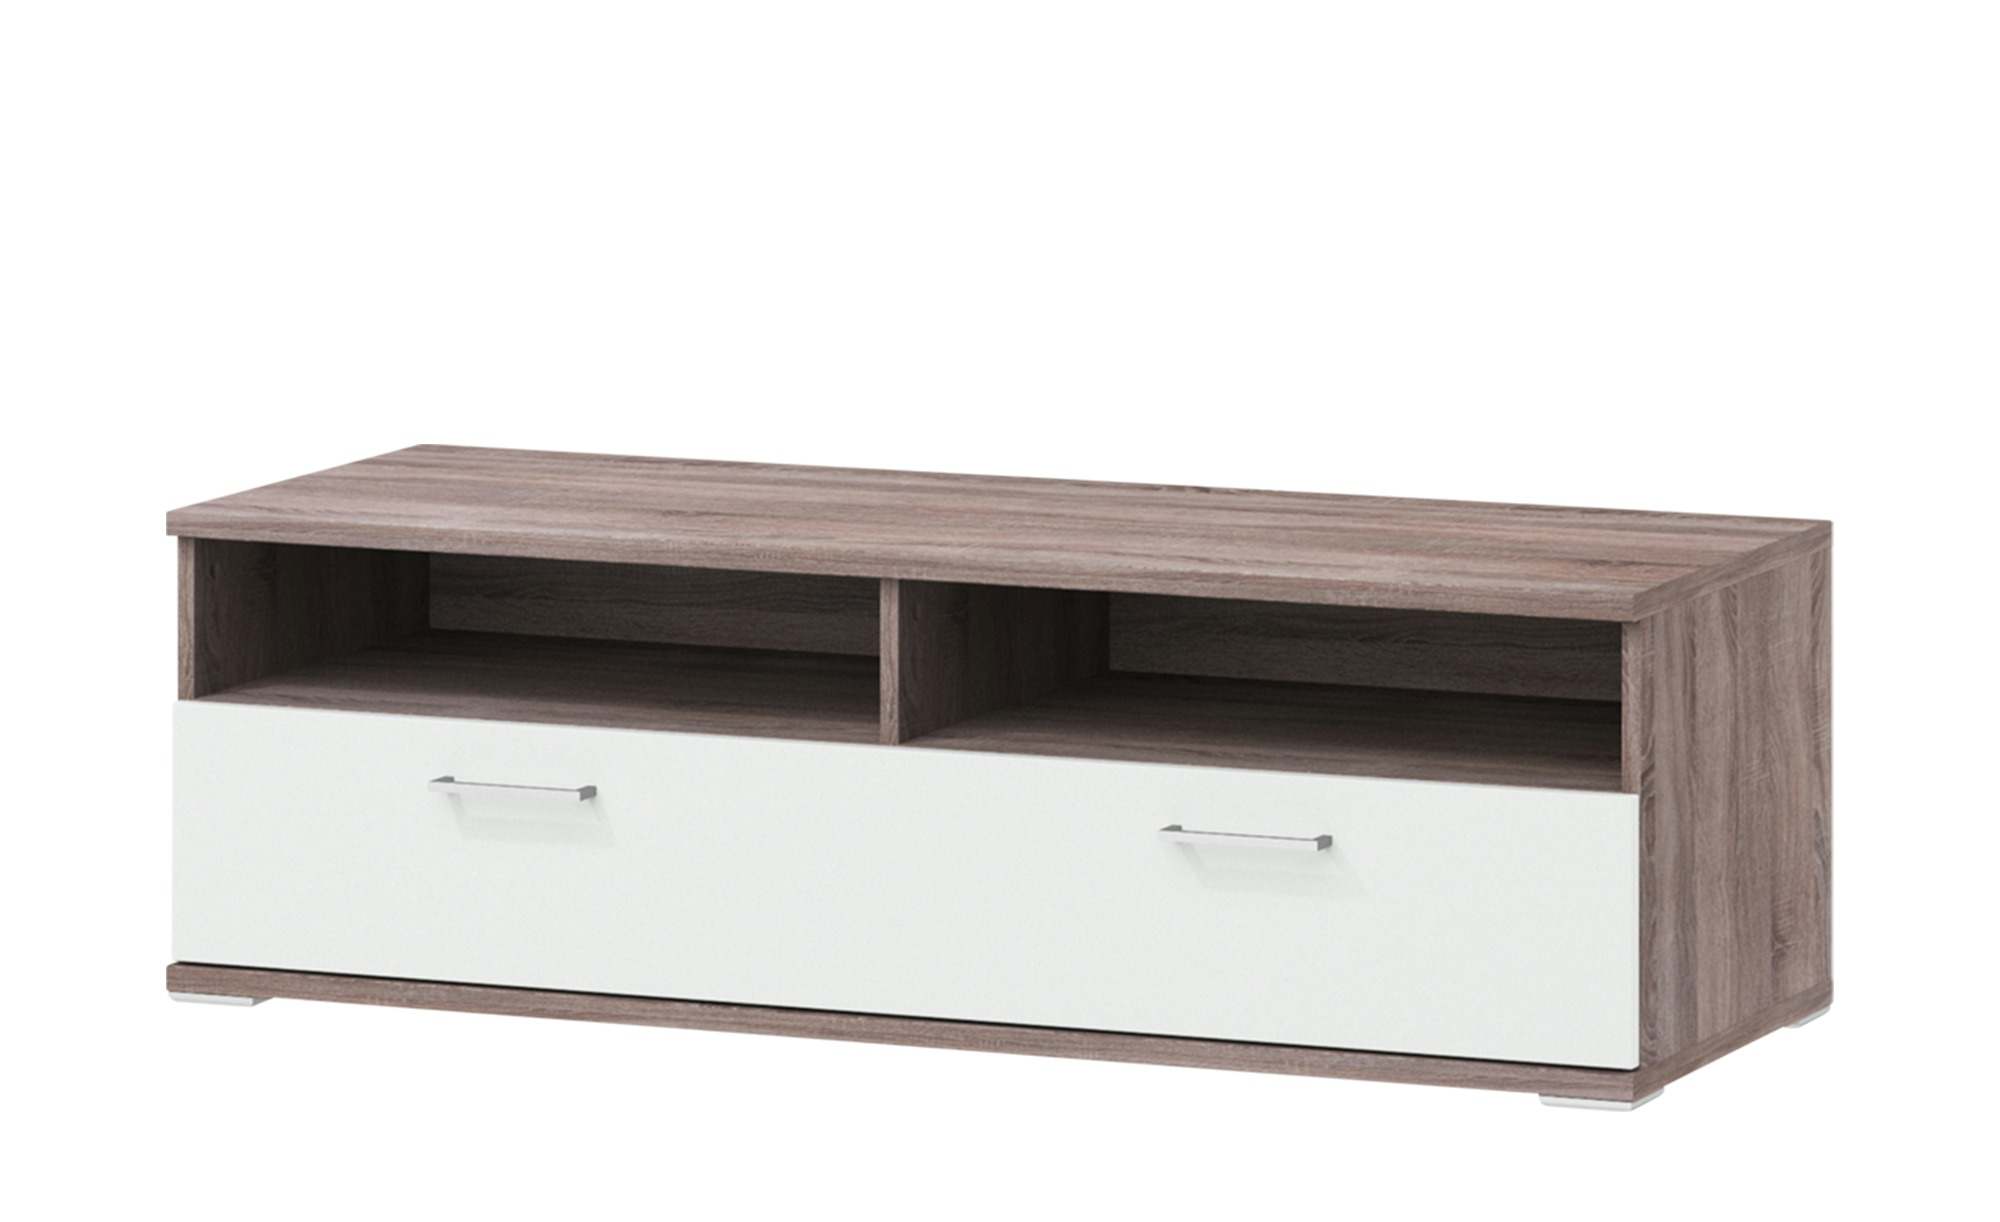 uno Lowboard  Onyx ¦ Maße (cm): B: 130 H: 42 T: 49 Kommoden & Sideboards > Lowboards - Höffner